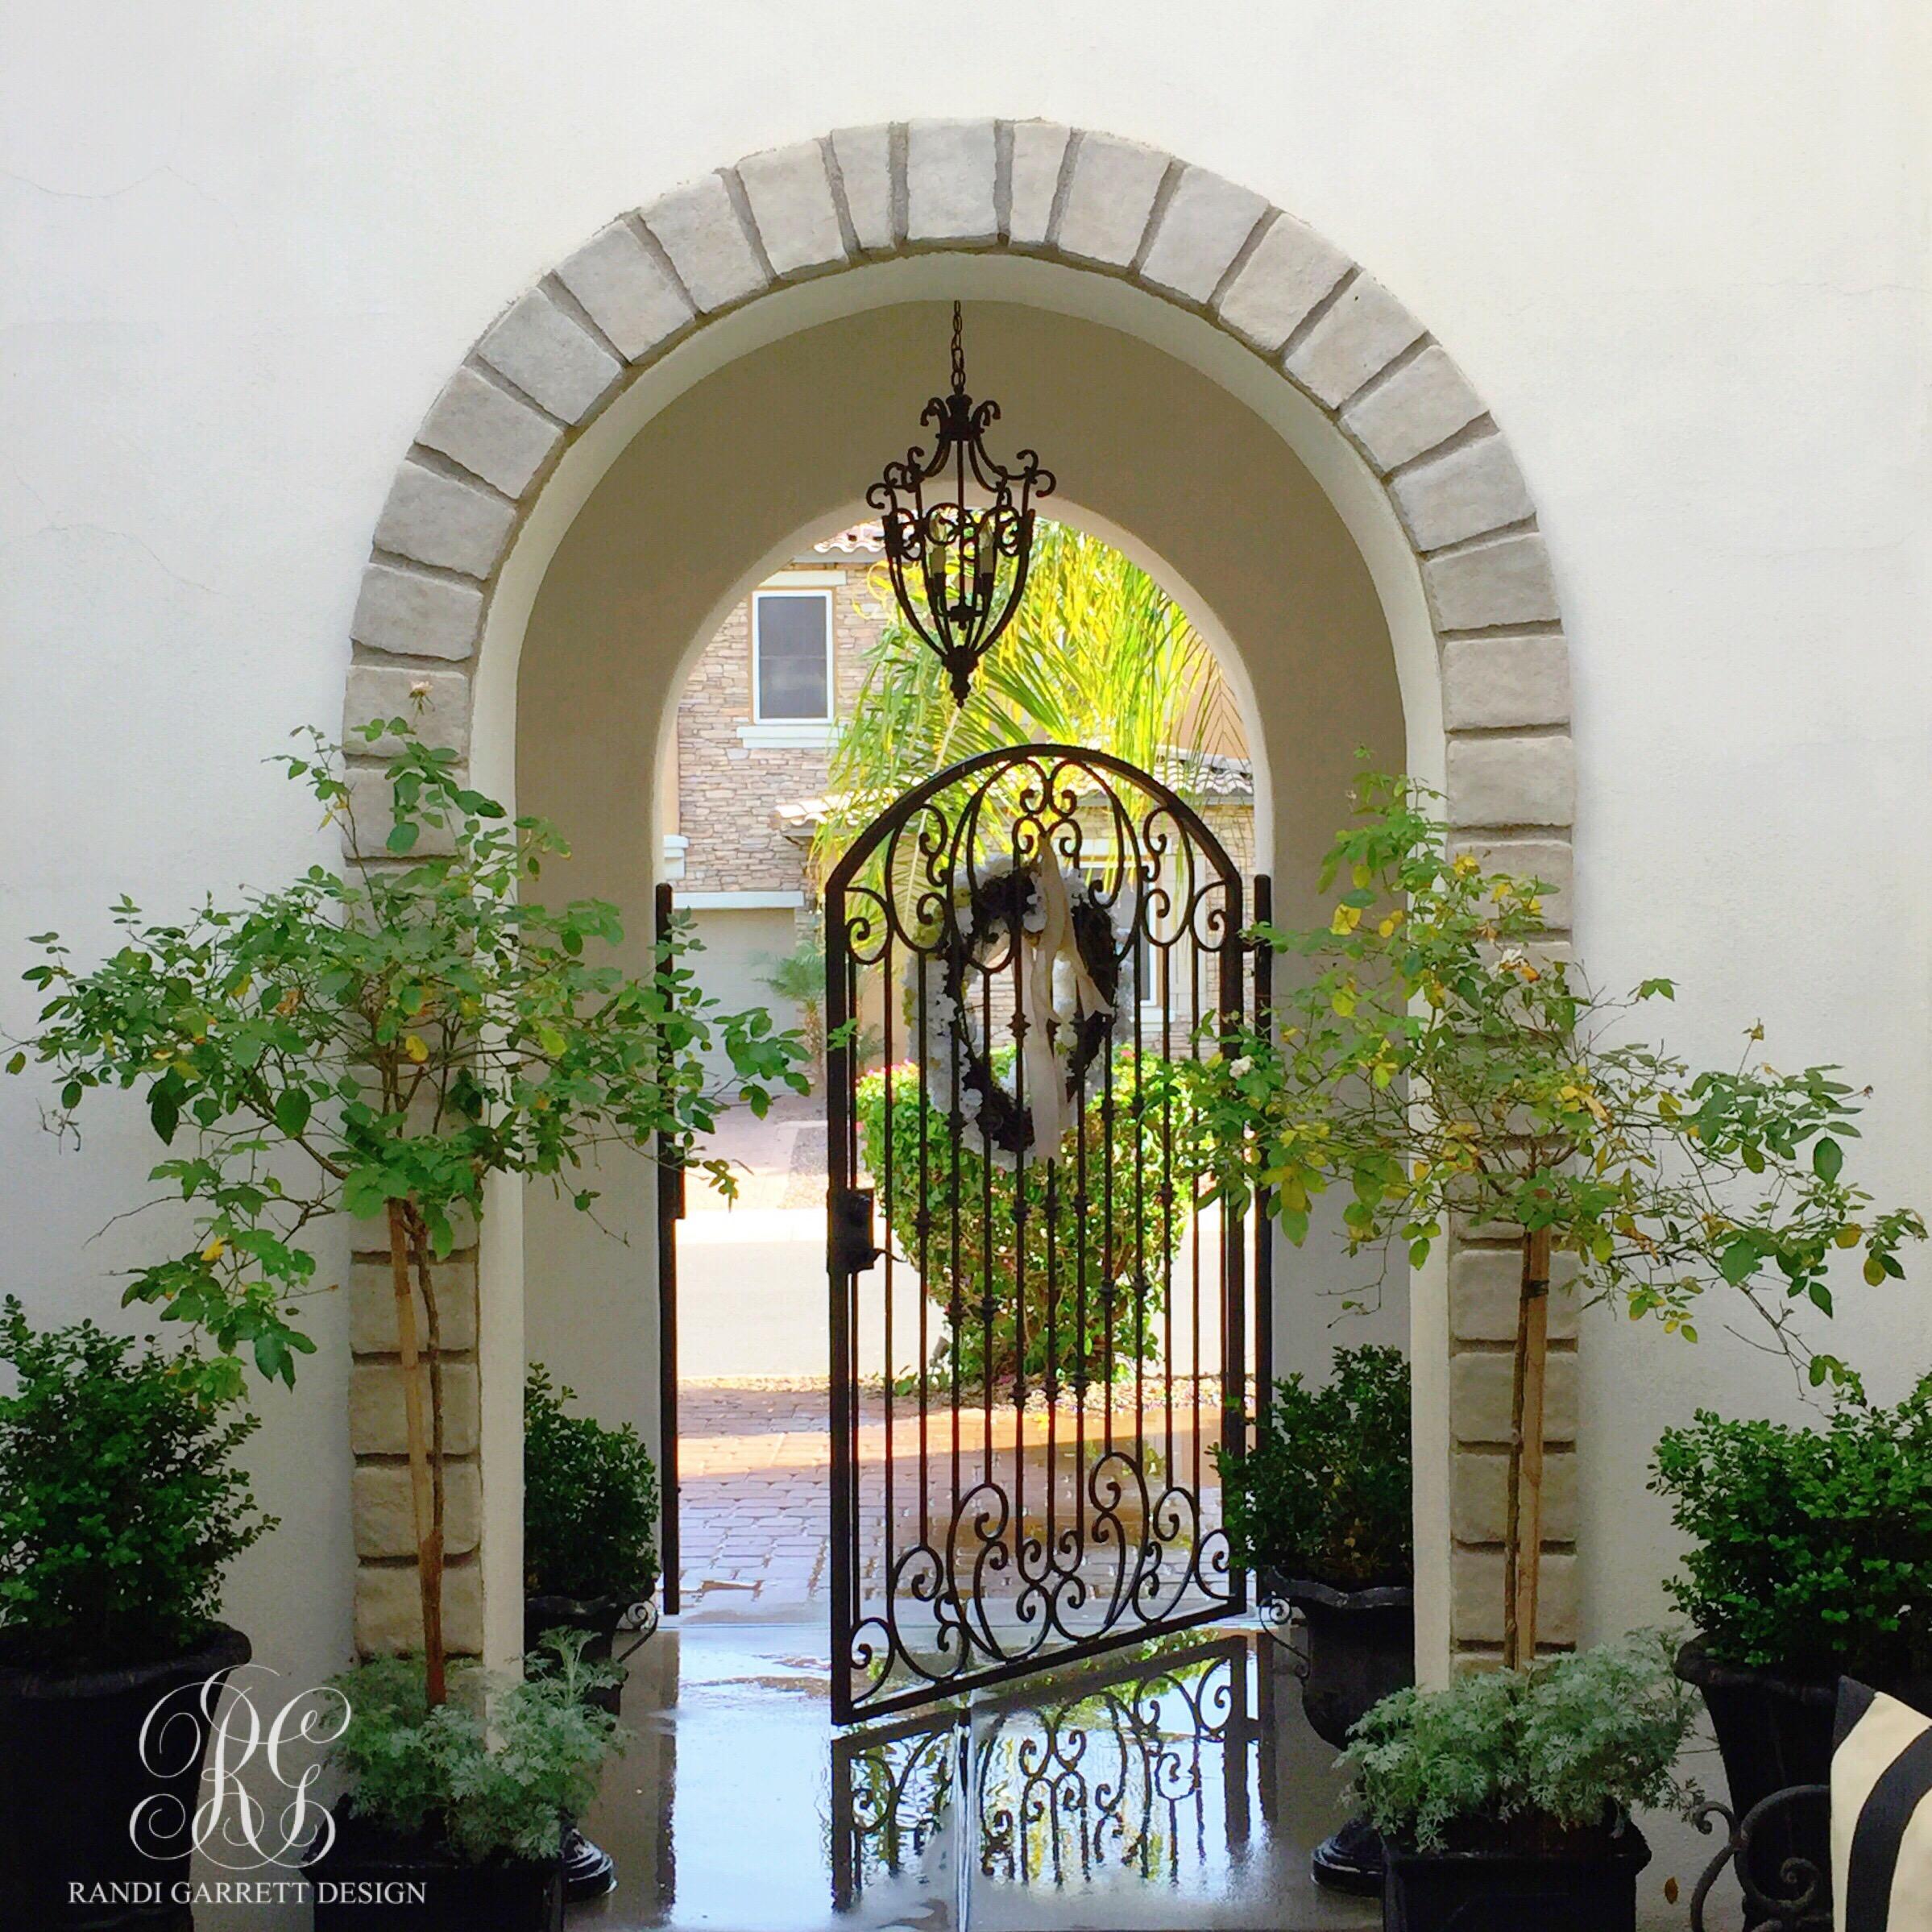 How to freshen your porch for spring by Randi Garrett Design